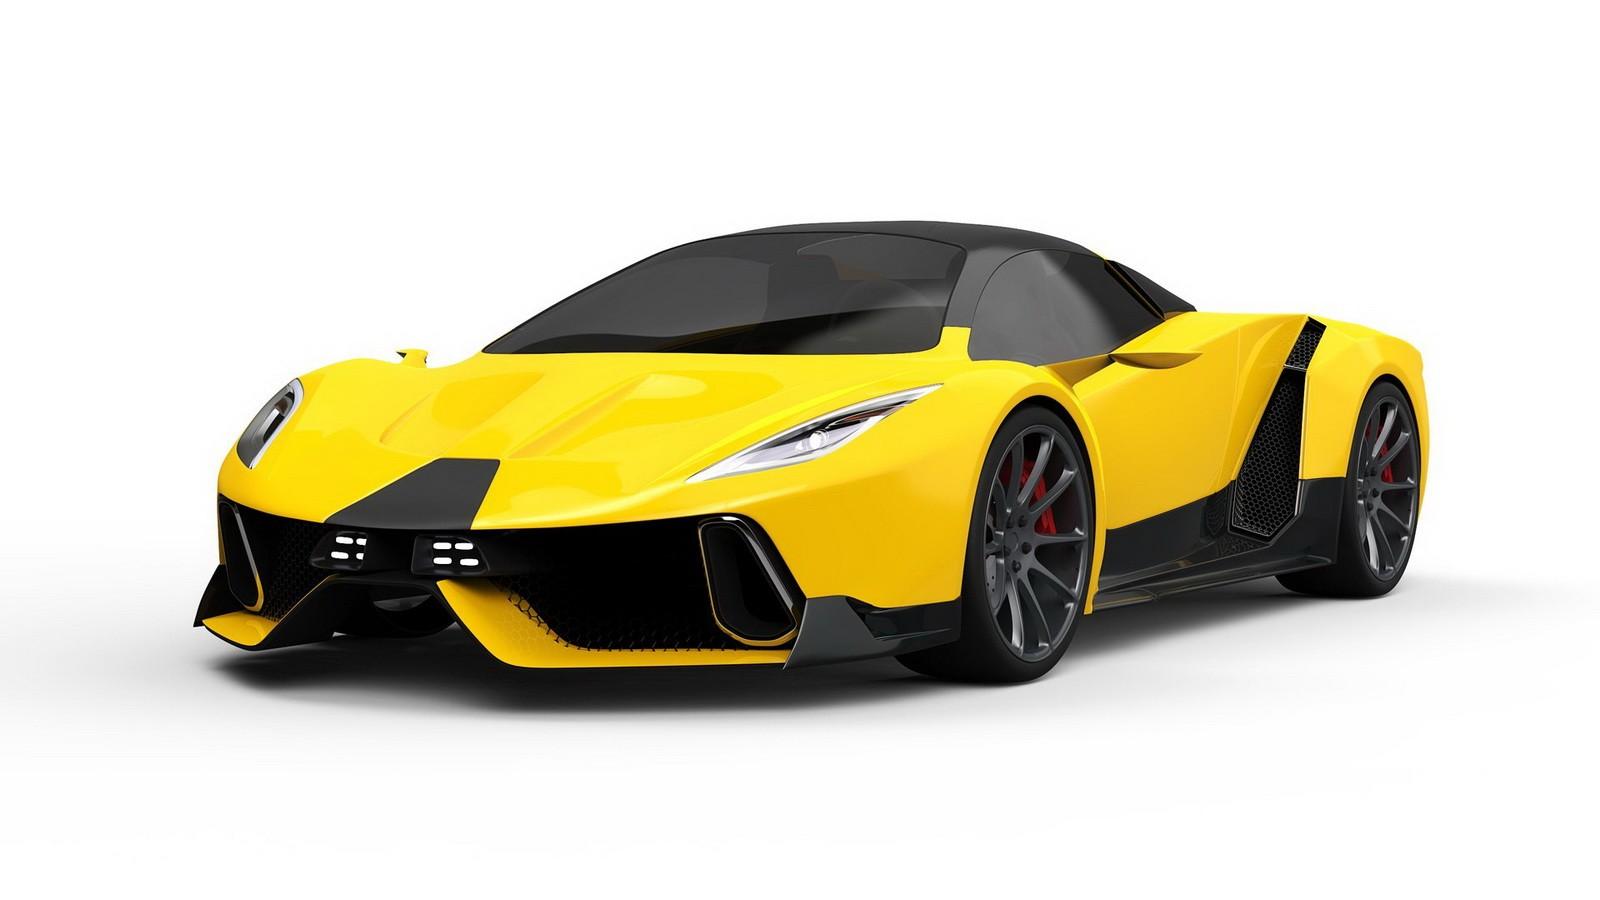 Psc Motors Reveals Sp 200 Sin Hypercar All We Get Is